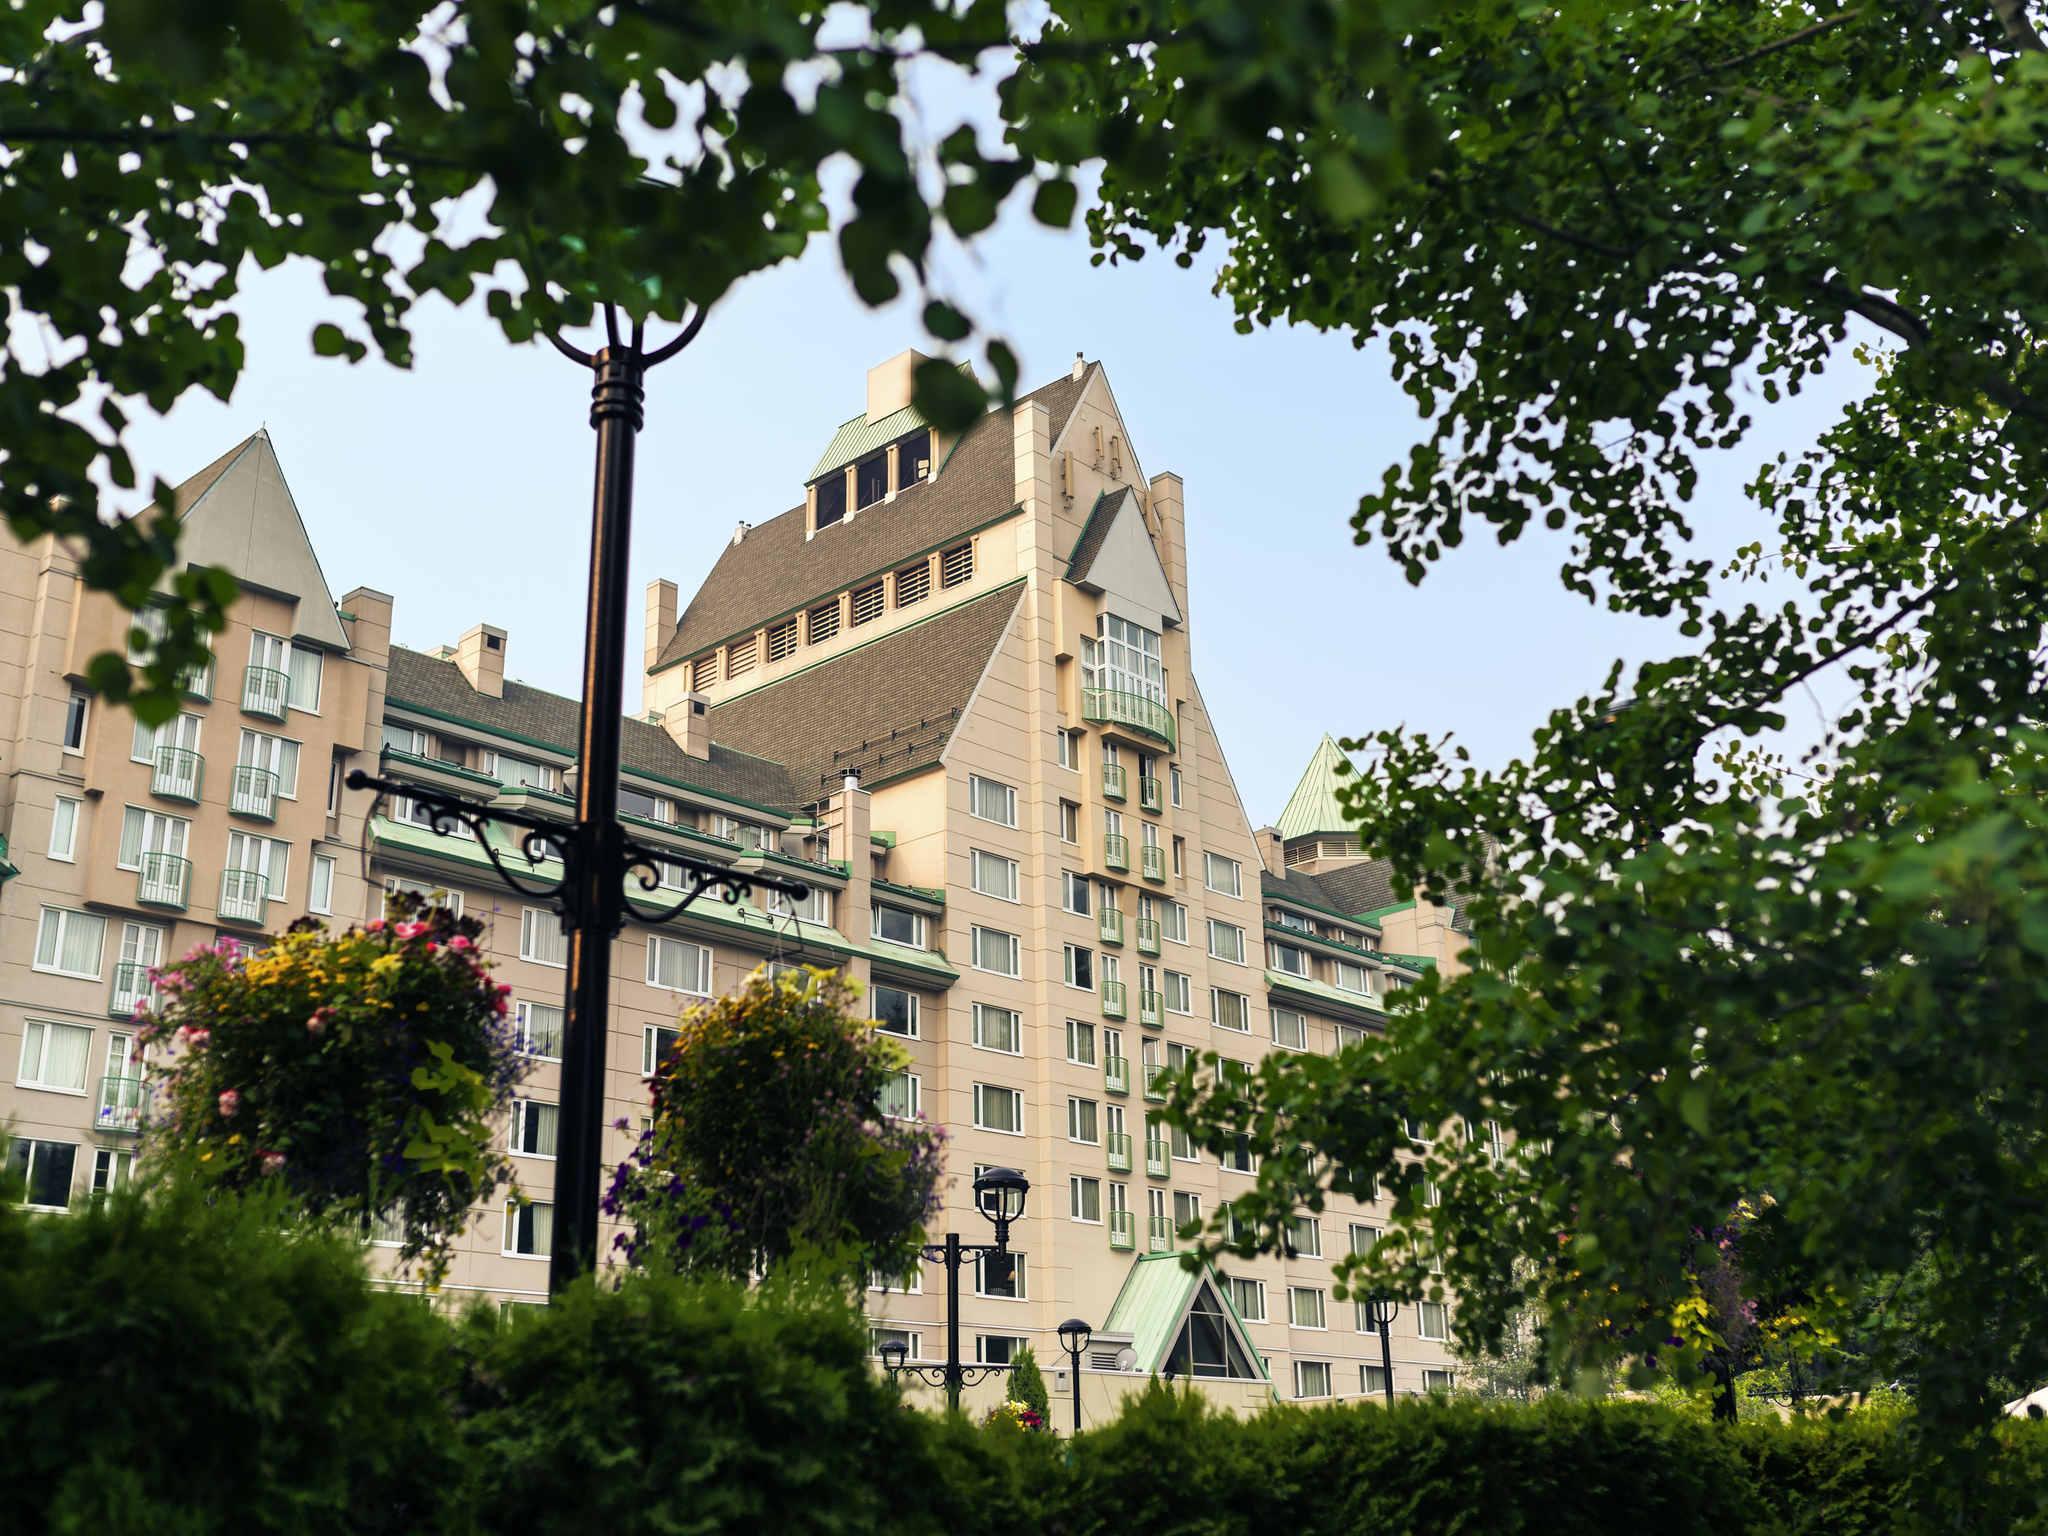 Hotell – Fairmont Château Whistler